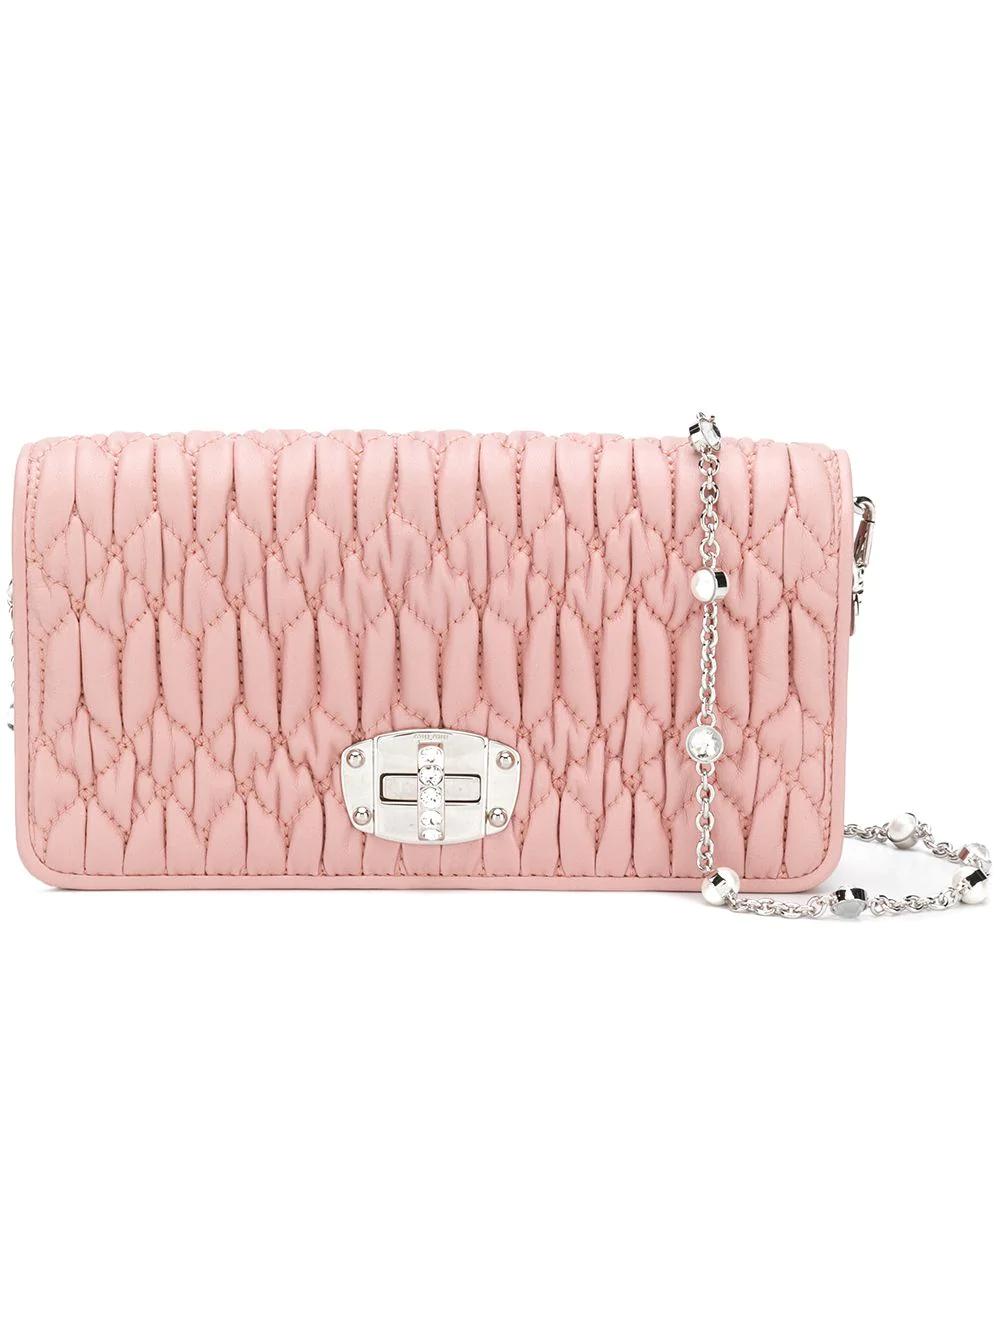 6101af32beb7 Miu Miu Iconic Crystal Matelassé Clutch - Pink